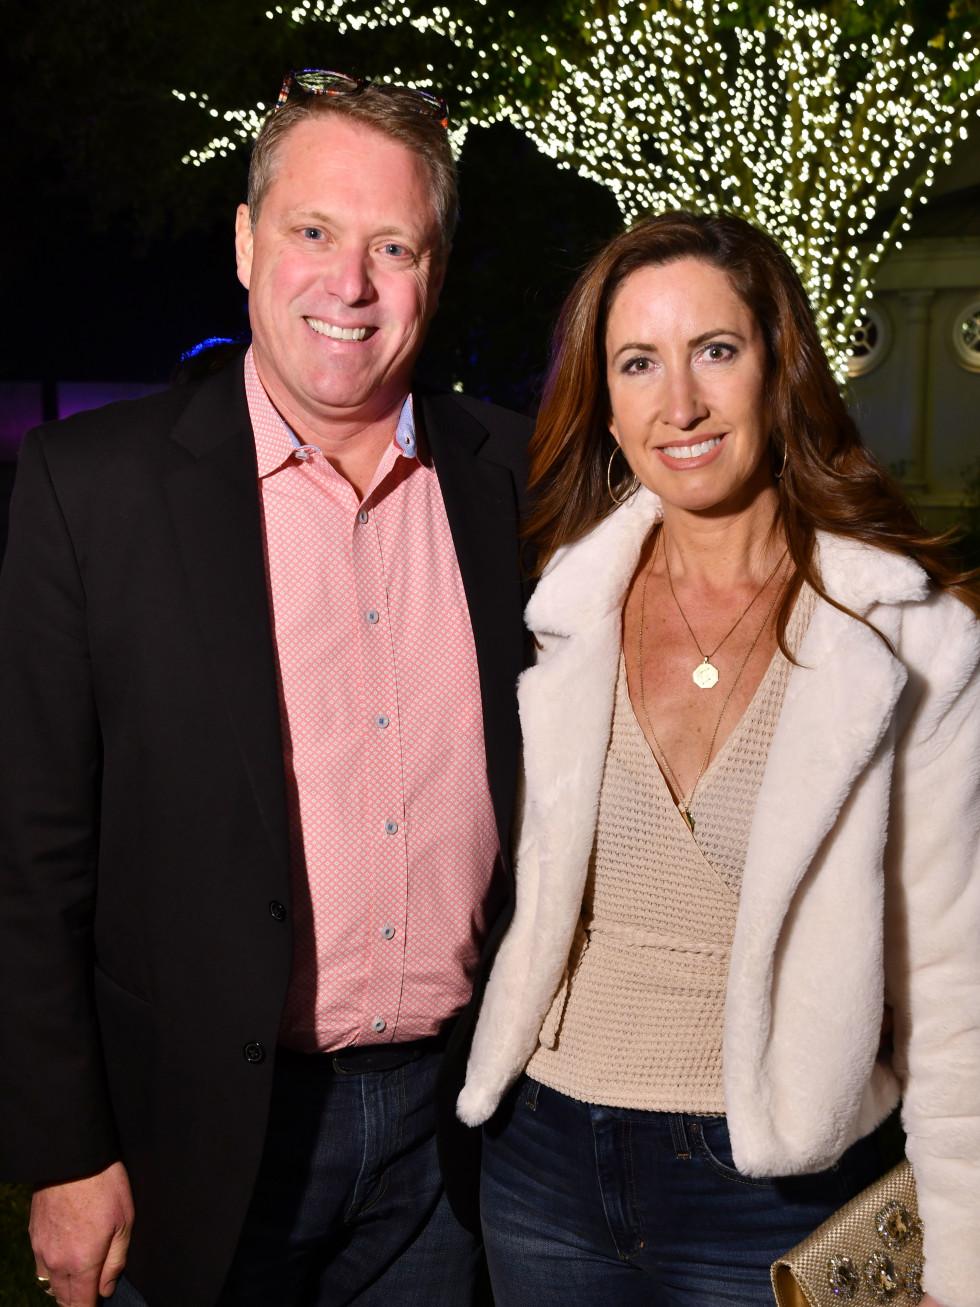 True Blue Gala 2019 John and Kathleen Booth